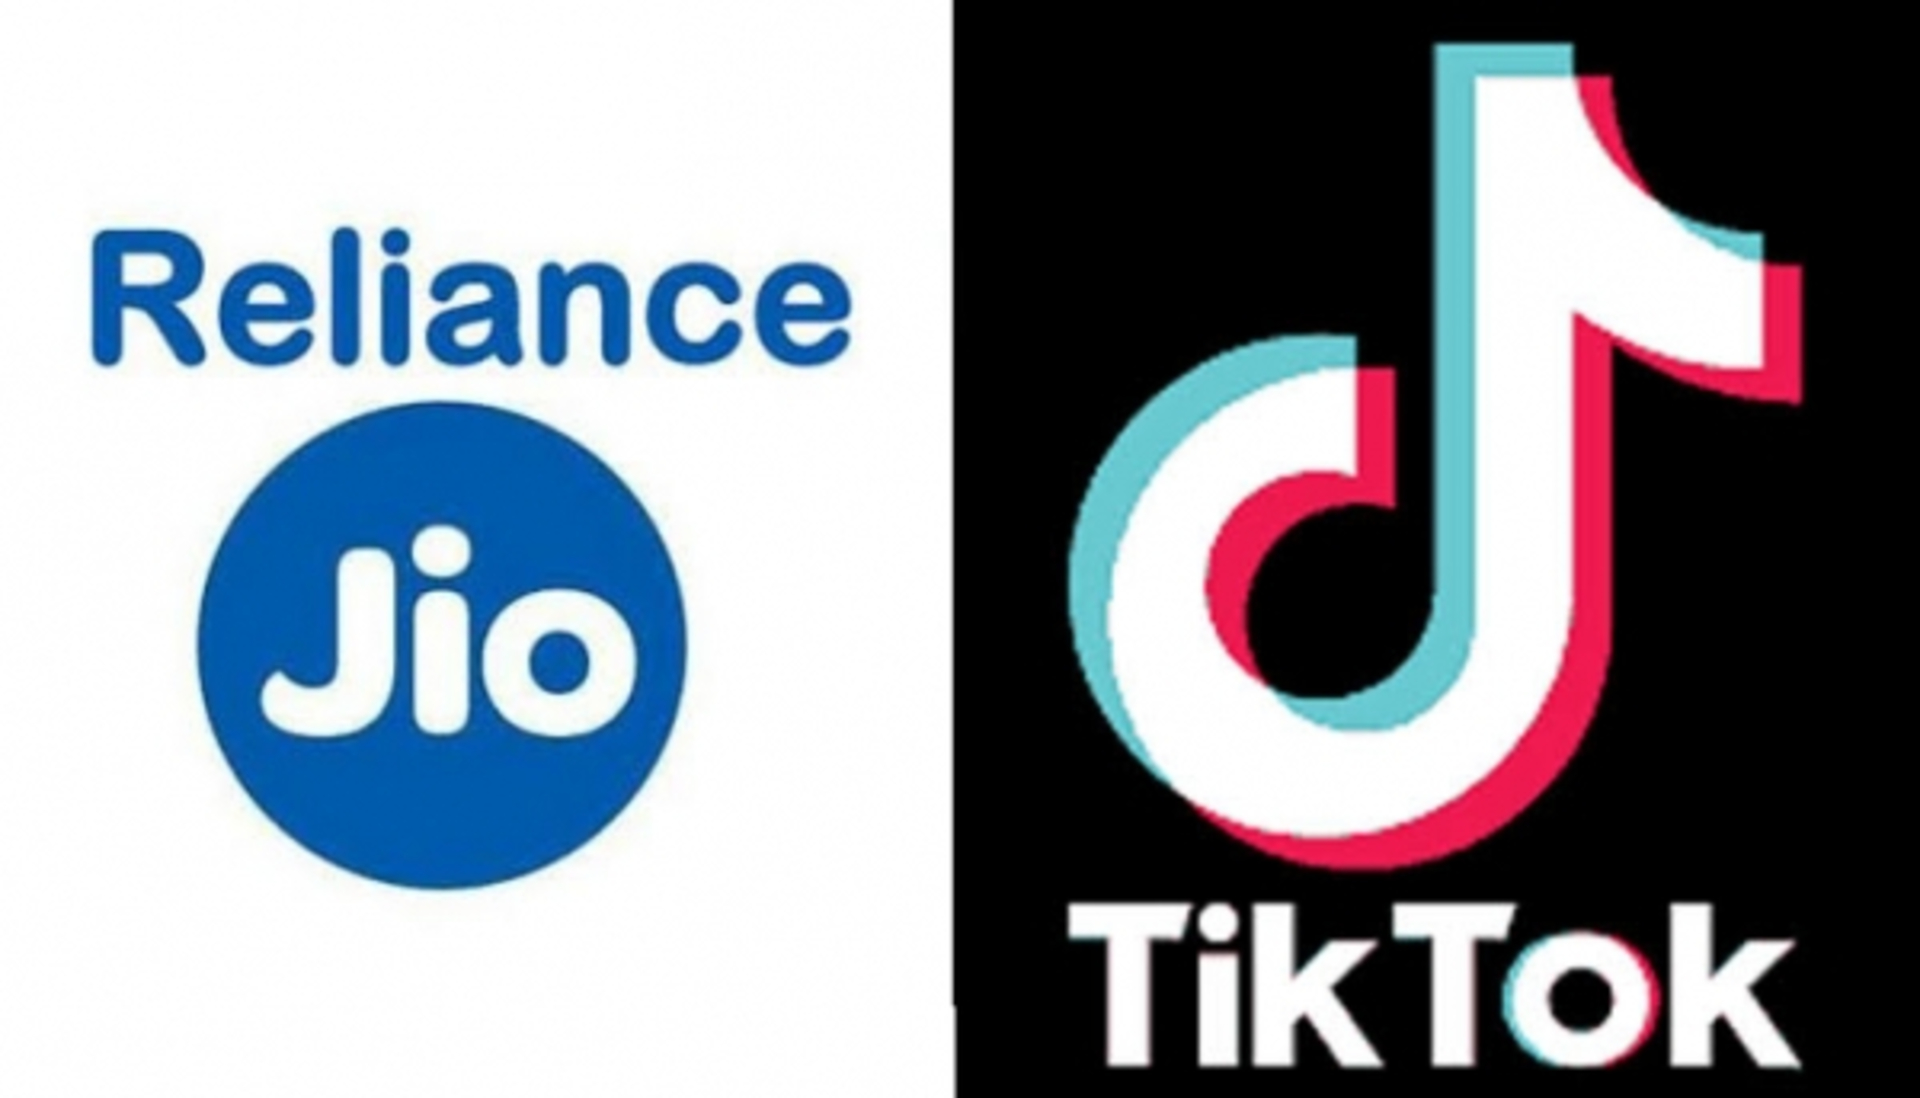 Winkl Blog - reliance-investment-likely-in-tiktok-talks-in-progress